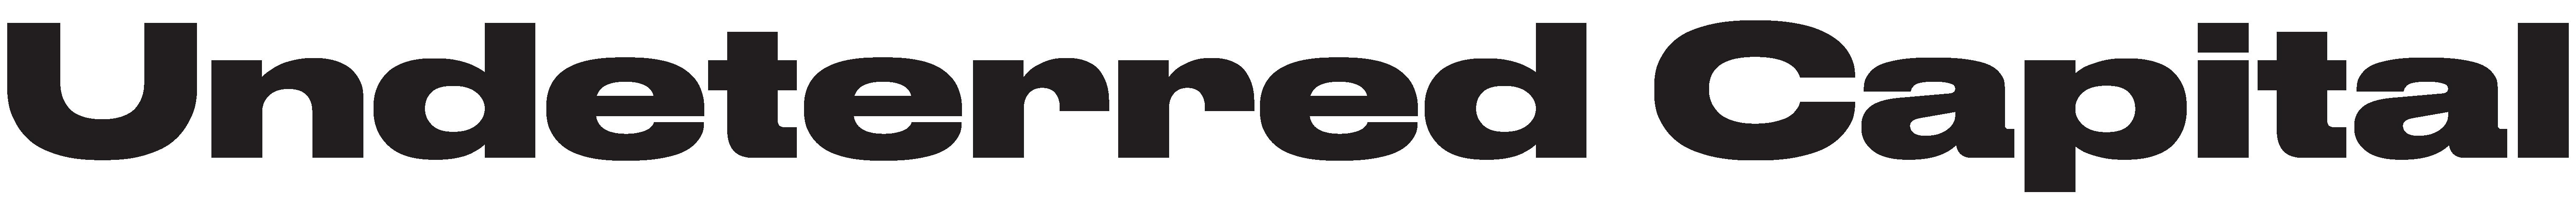 Undeterred Capital logo